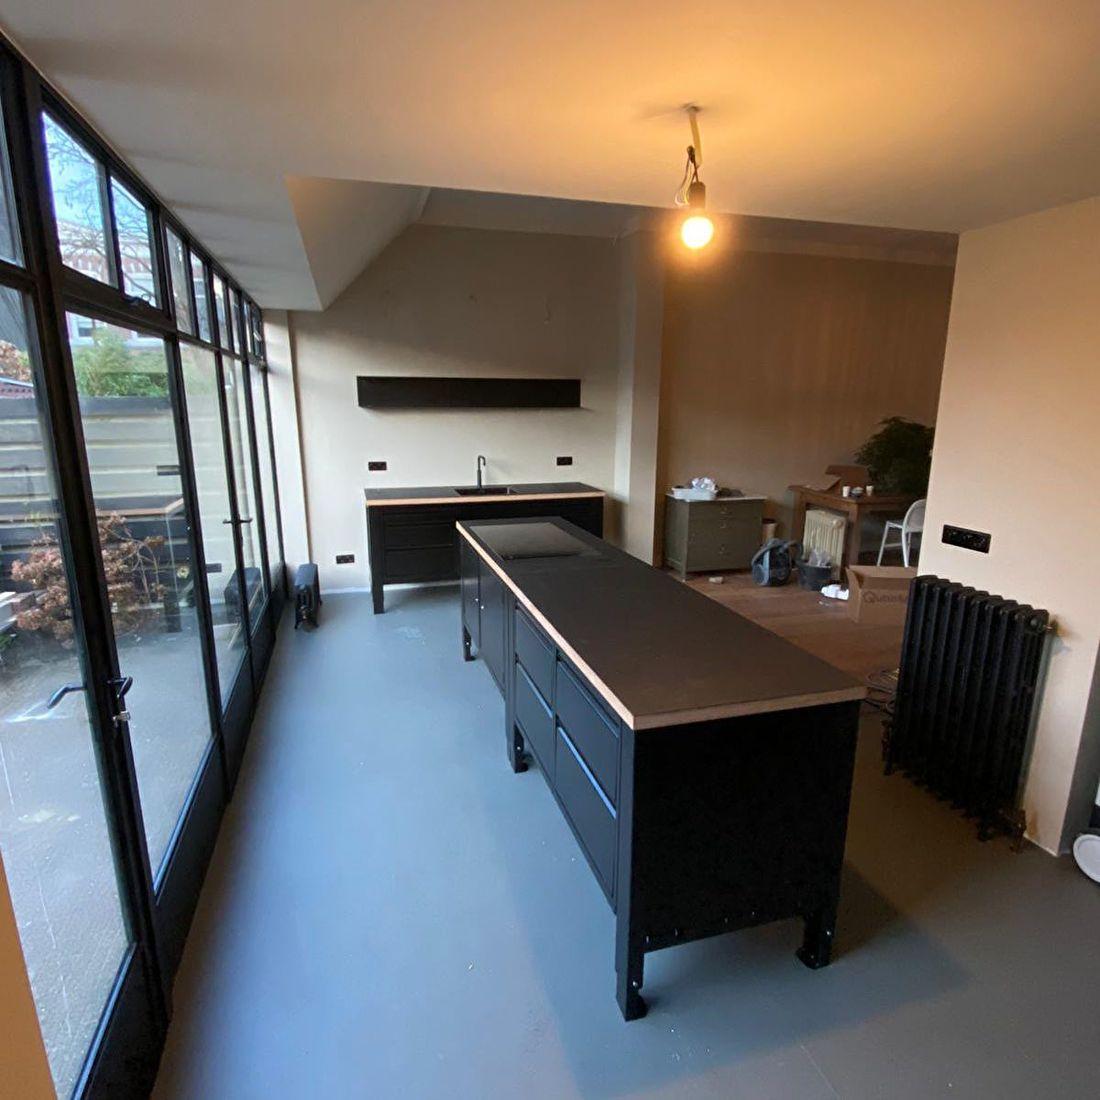 the big easy keuken eilandkeuken modular kitchen